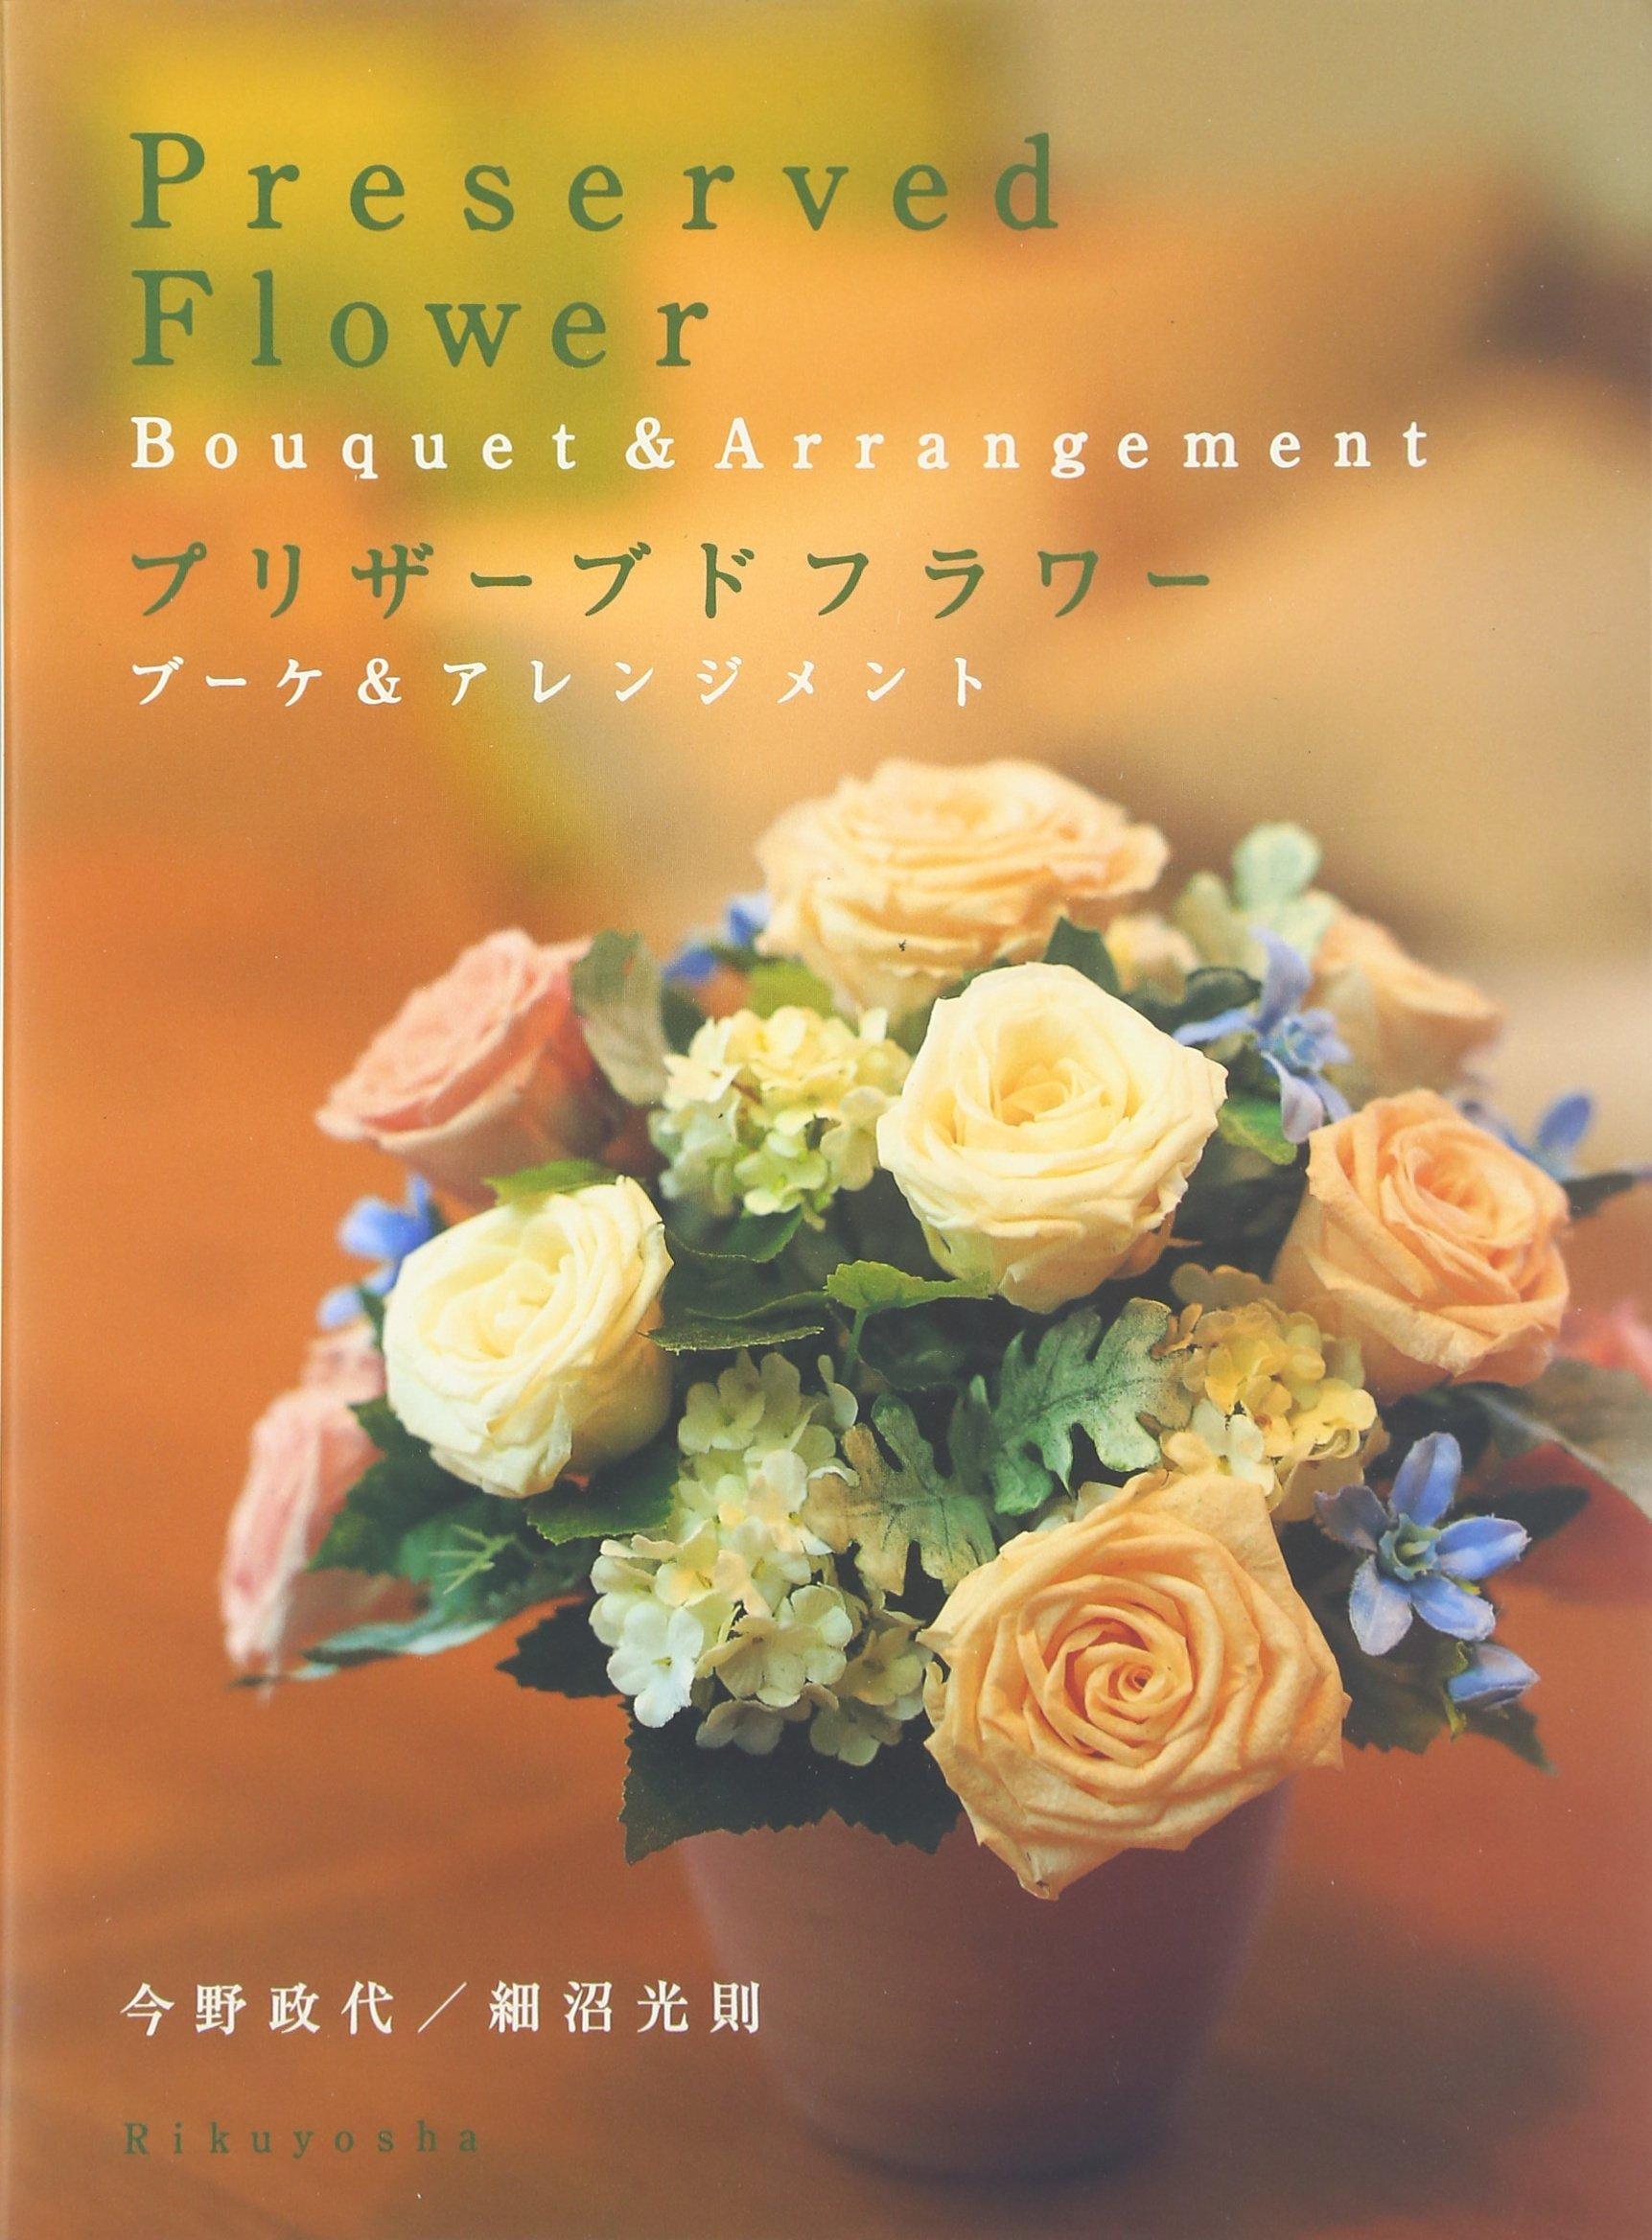 Preserved flower bouquet and arrangement konno masayo hosonuma preserved flower bouquet and arrangement konno masayo hosonuma mitsunori 9784897374420 amazon books izmirmasajfo